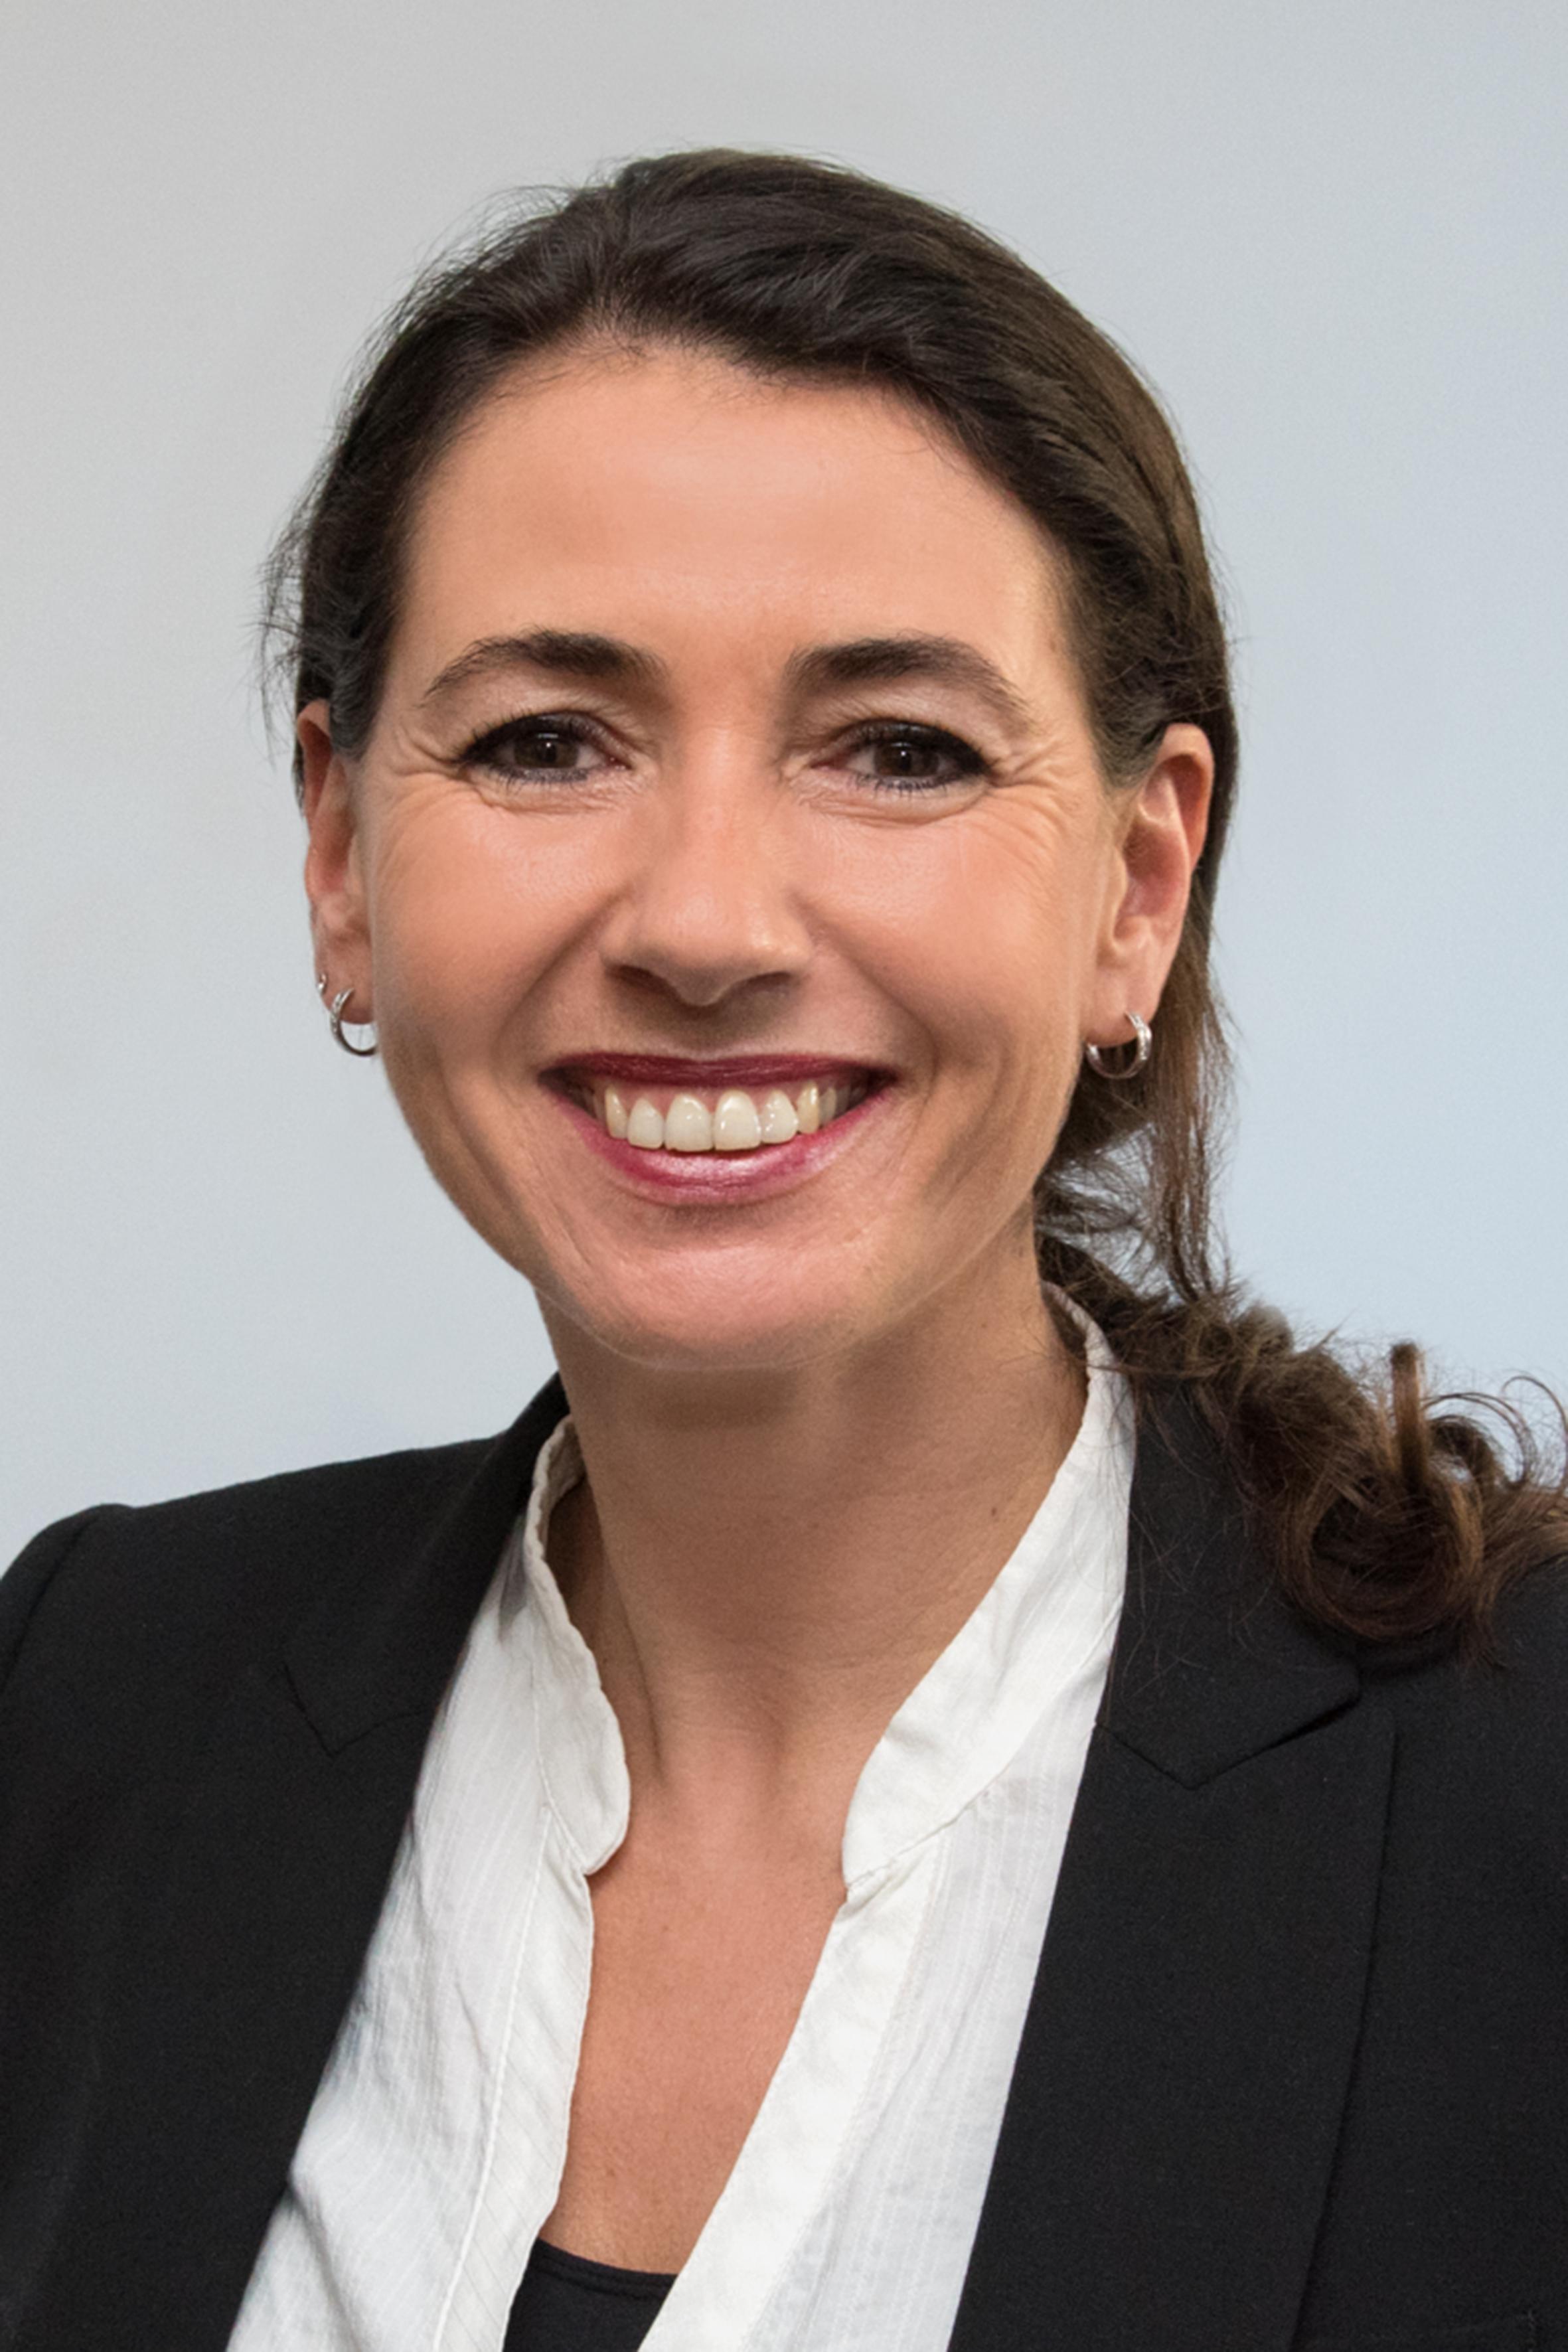 Daniela Mäß